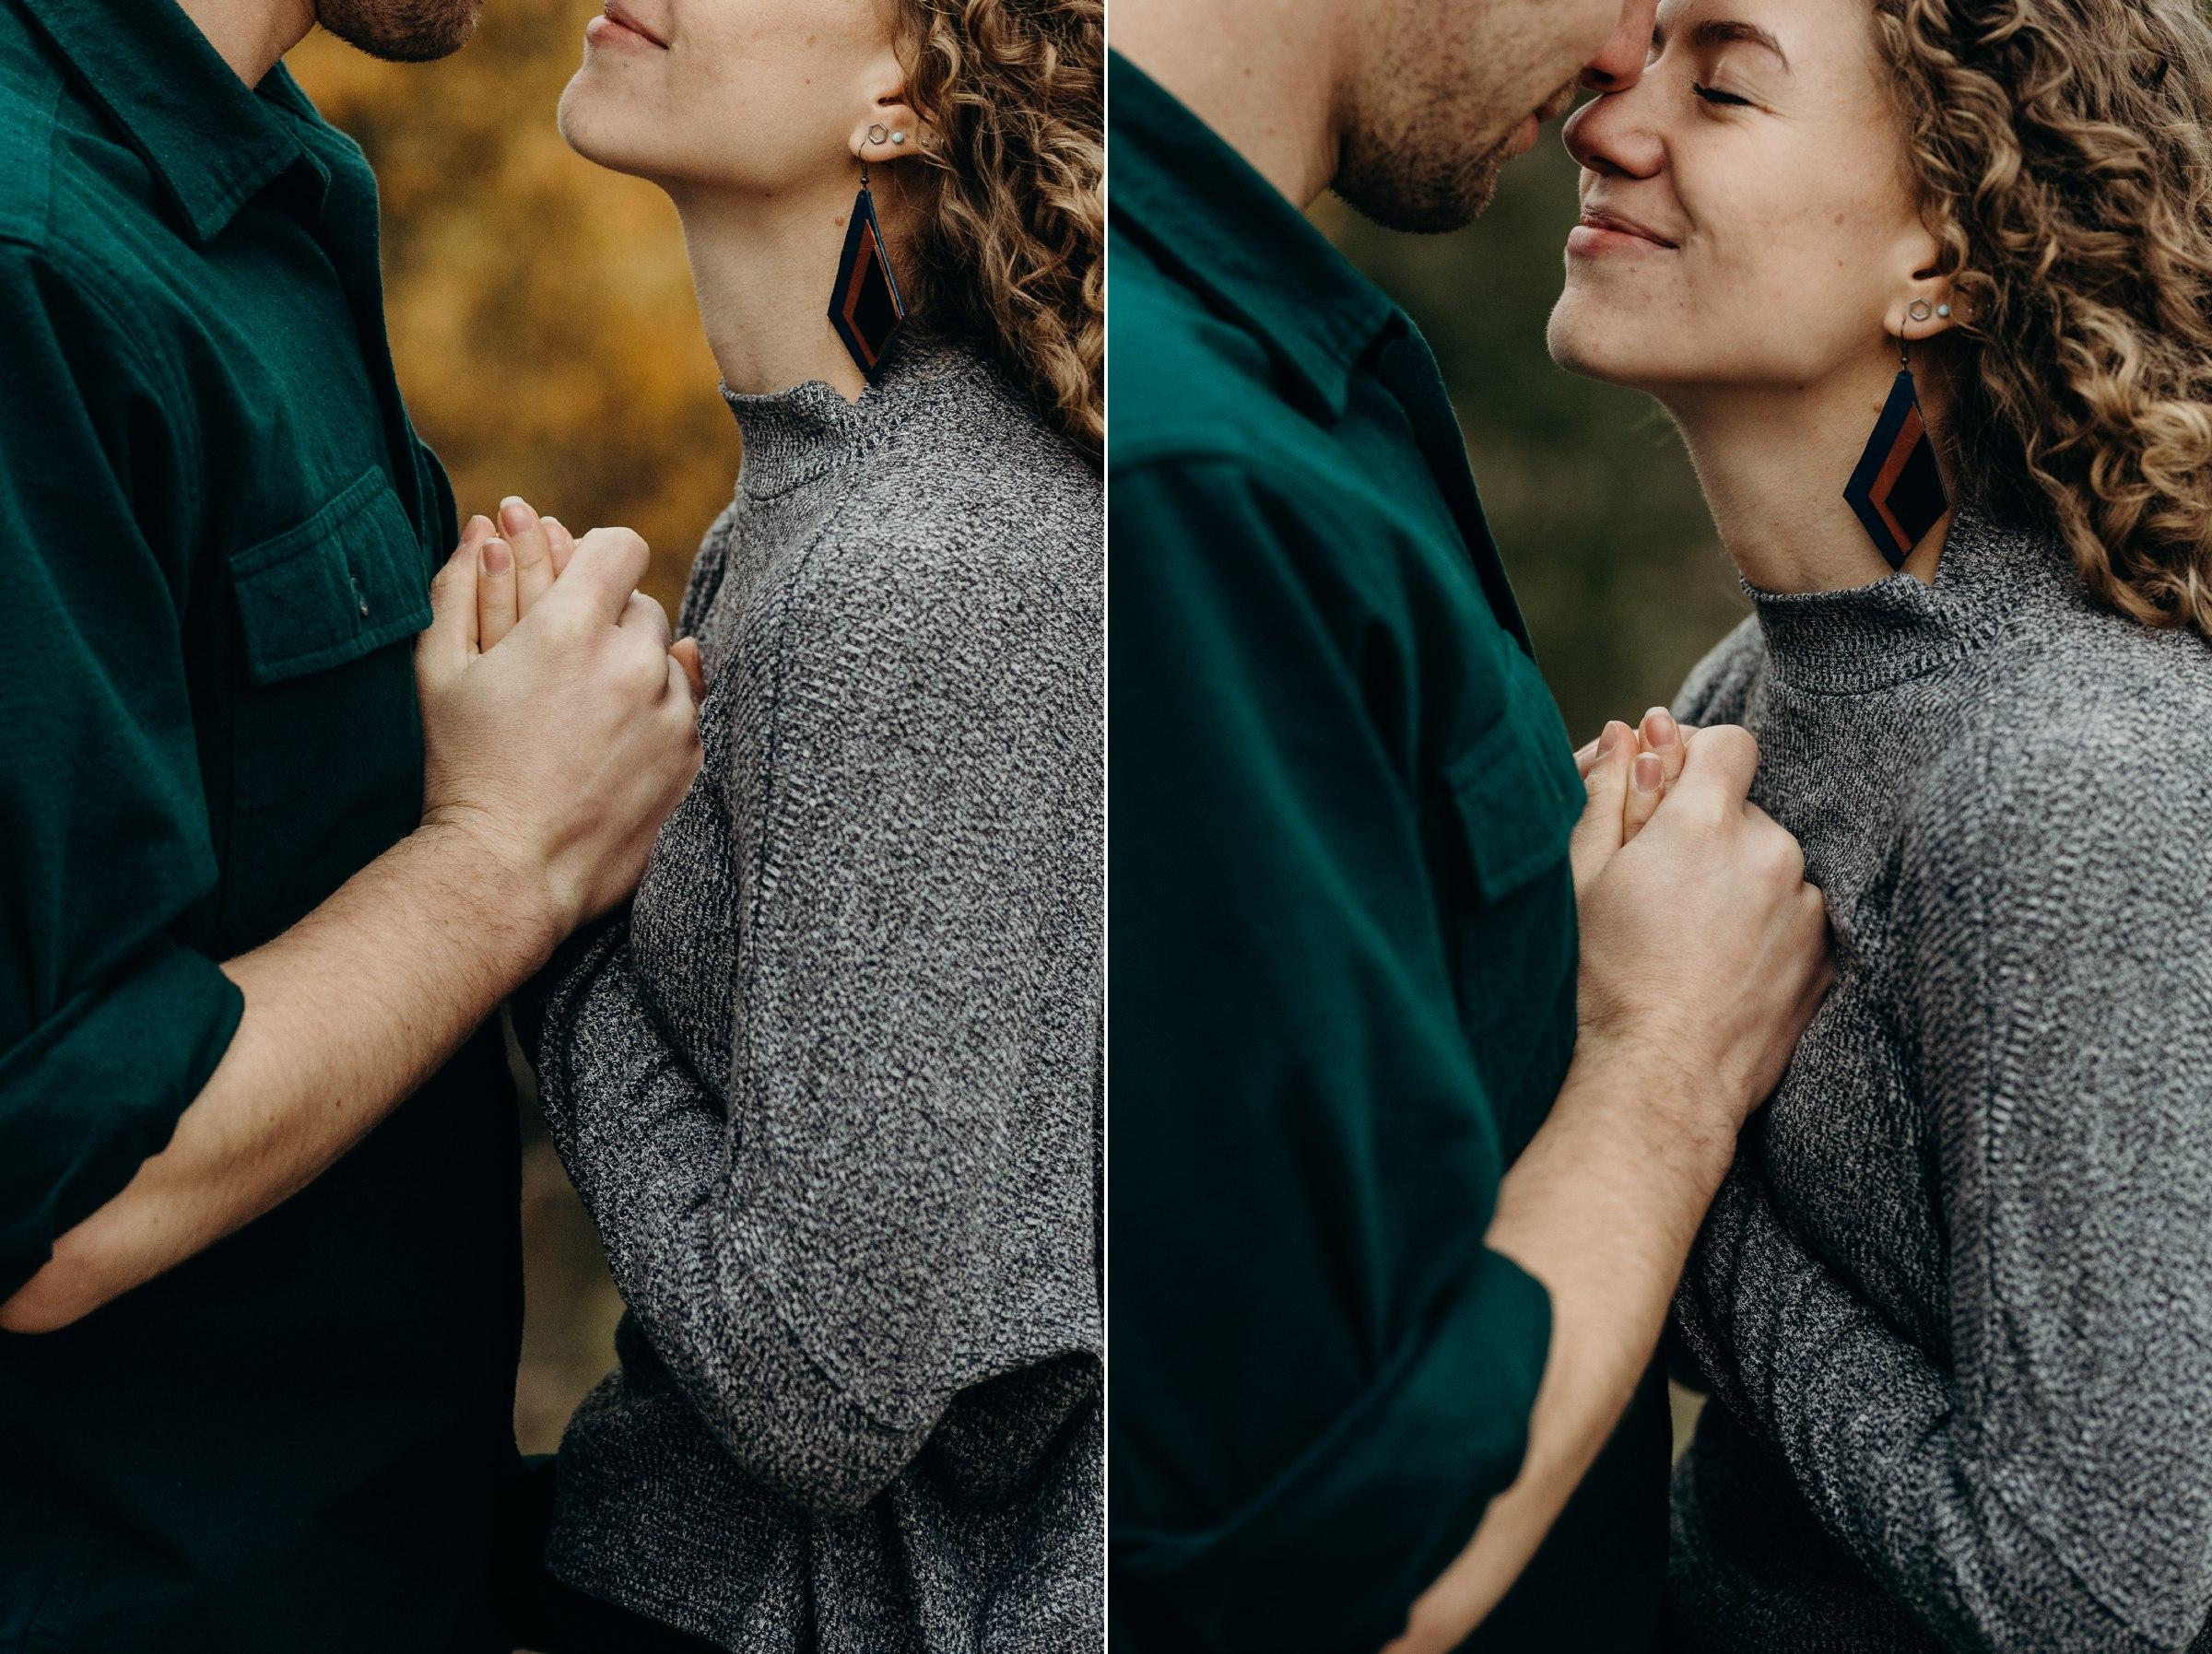 nickmezaphotography-austin-minneapolis-wedding-photographer-elopement-best-intimate-adventurous-destination-texas-minnesota-engagement-jess-dan-spacesaver_0202.jpg